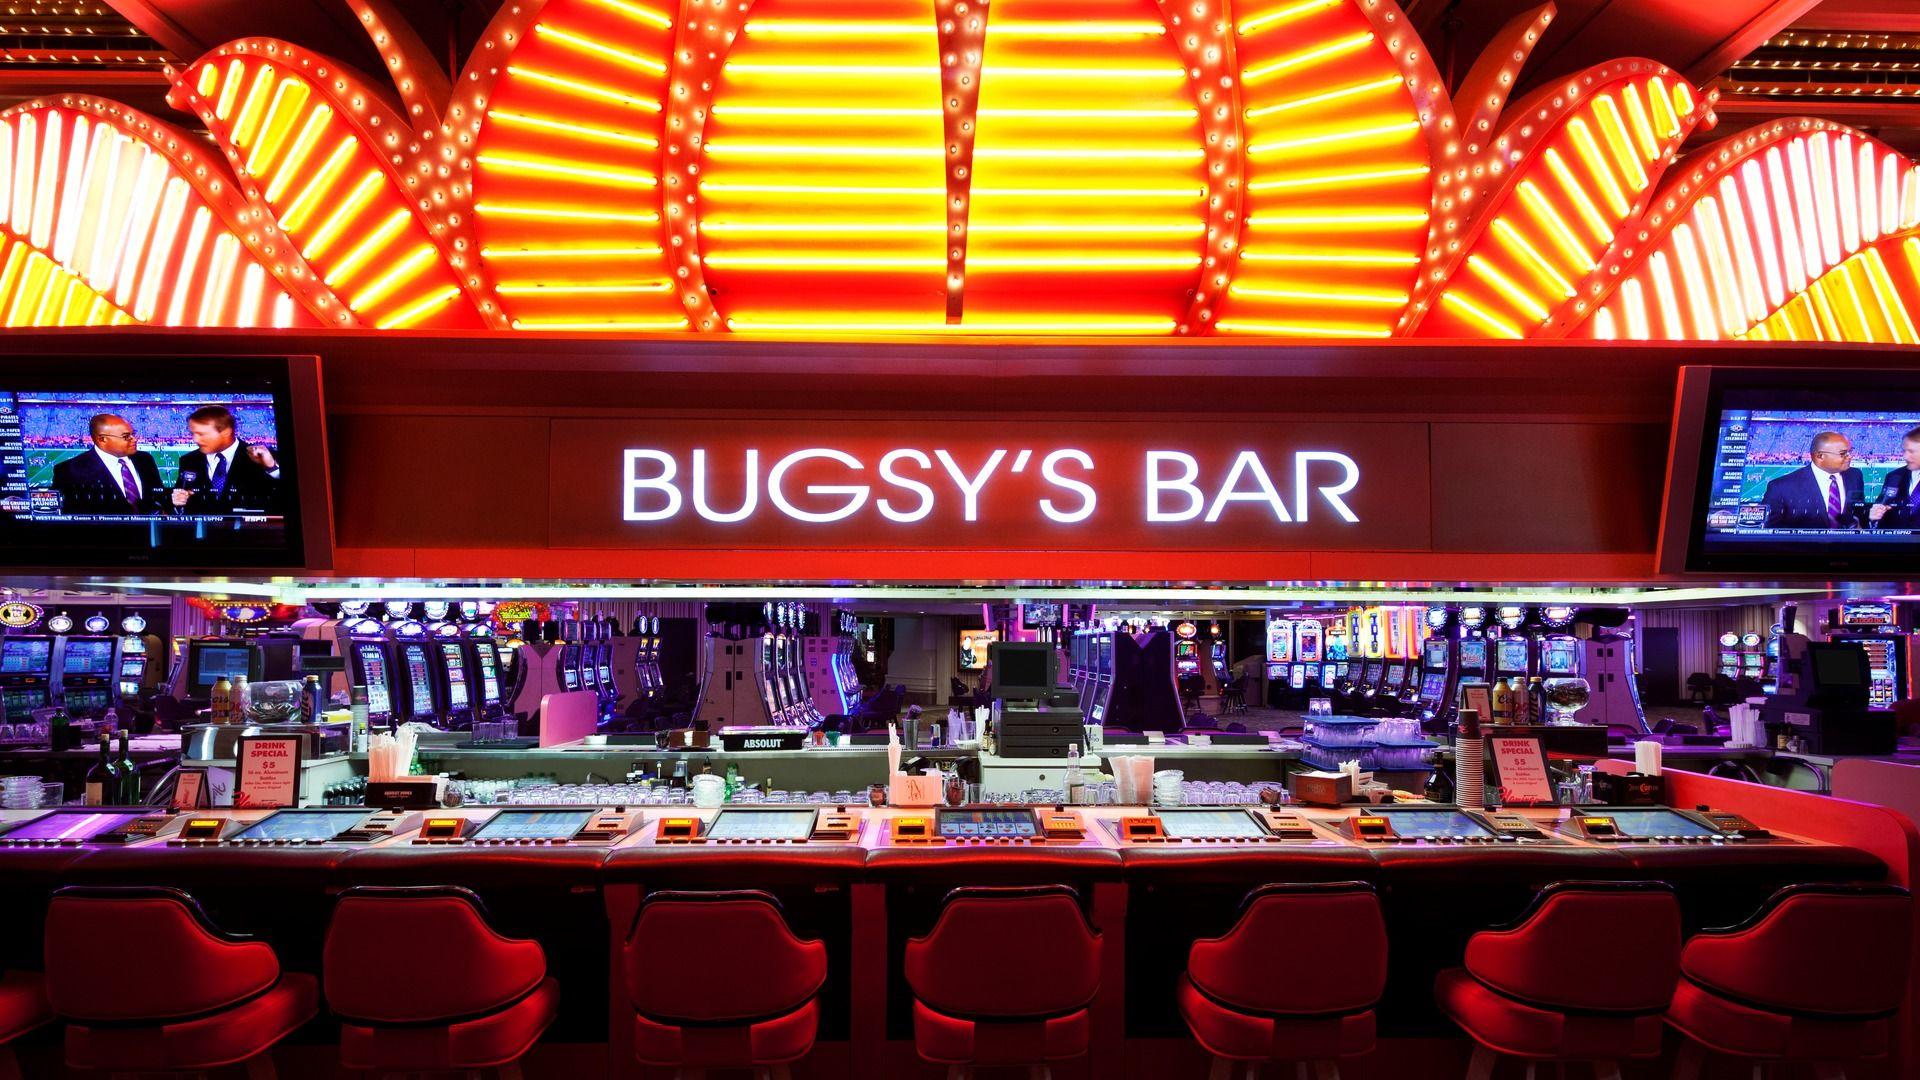 sindy vegas suck 1000+ ideas about Las Vegas World on Pinterest | Las vegas shows, Las vegas  city and Las vegas holidays